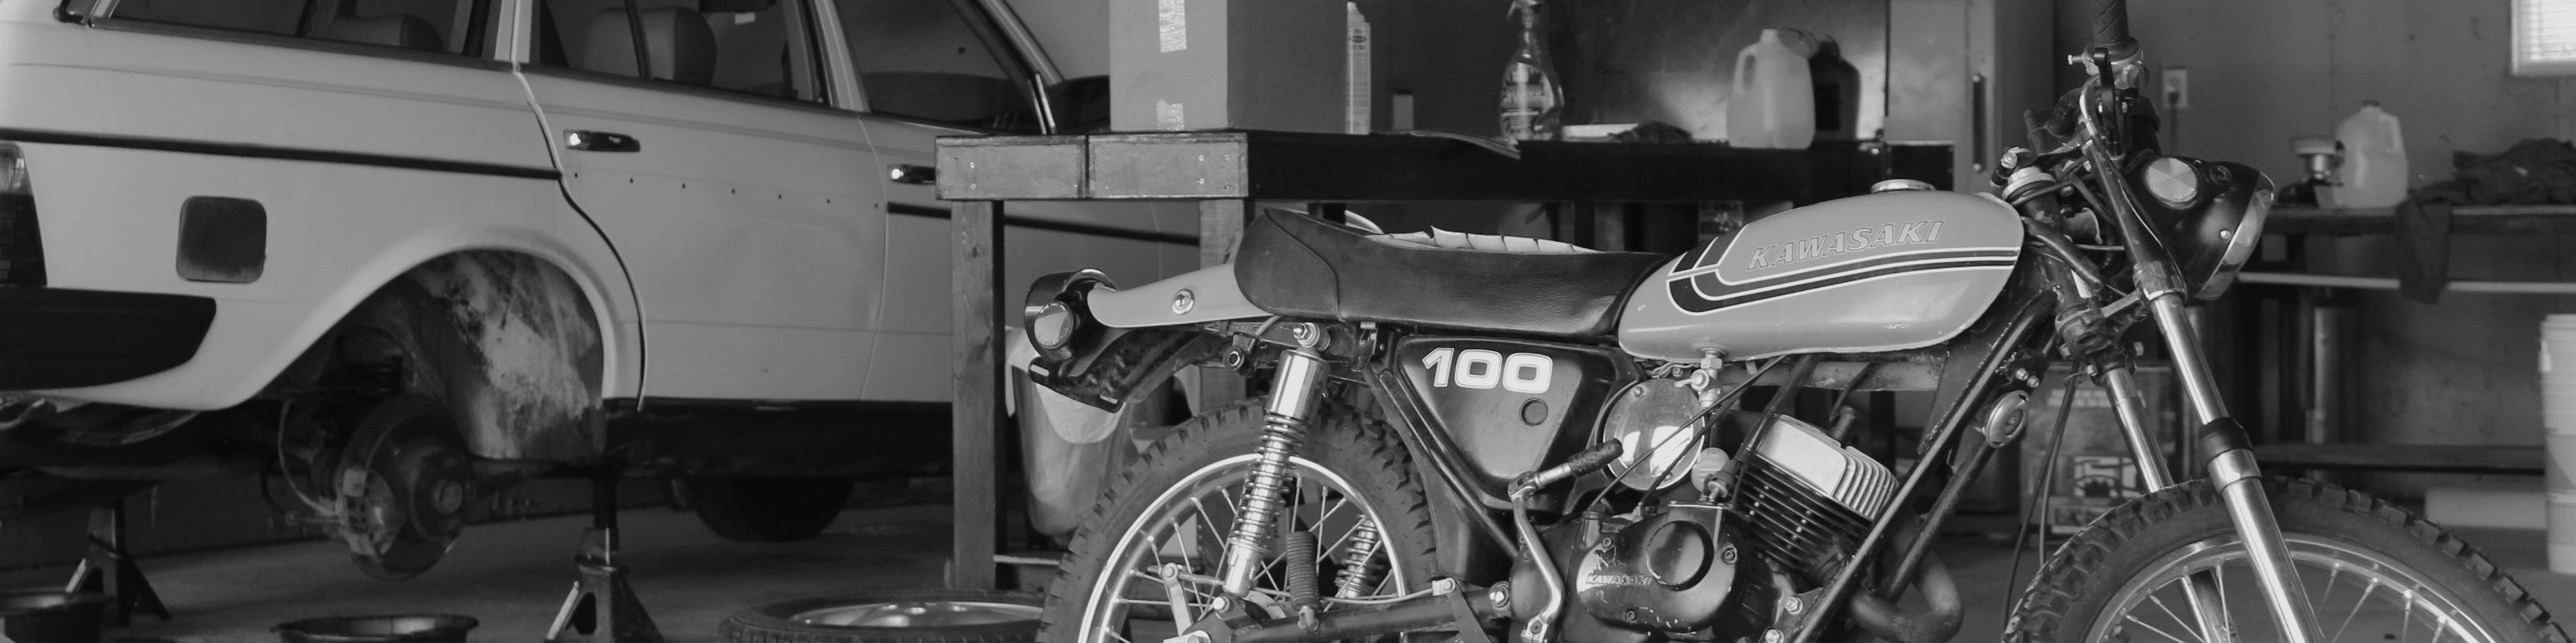 Piston Slap Garage